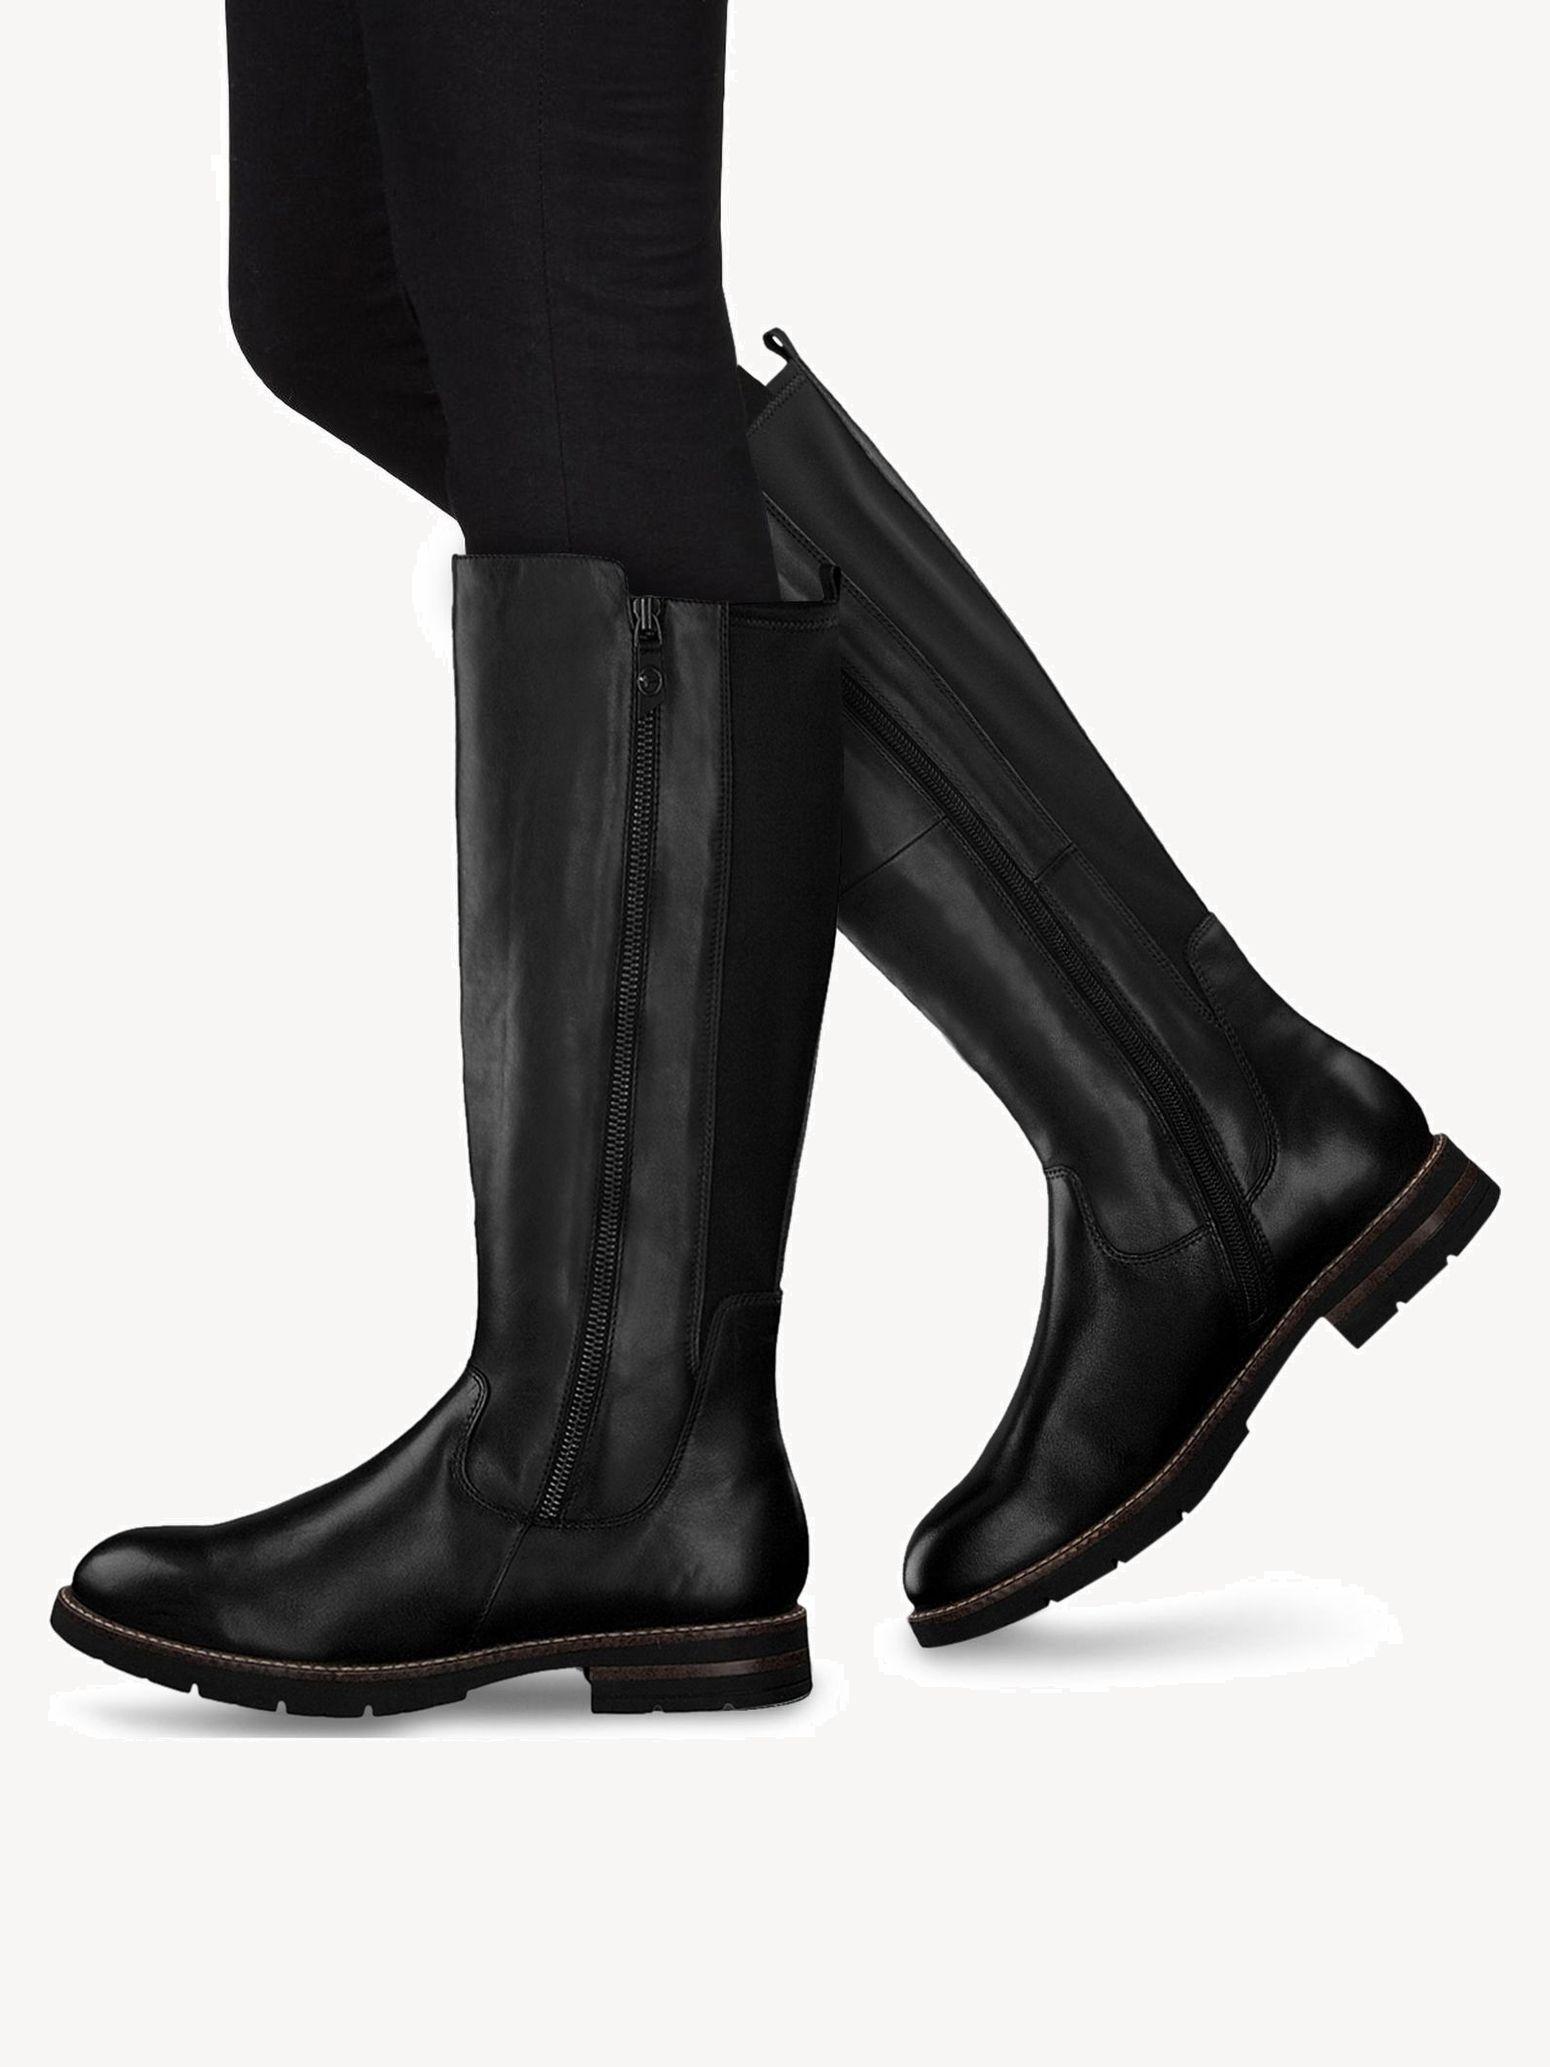 1 Lederstiefel Online Kaufen 1 21Tamaris 25604 Stiefel OPy0Nvm8nw